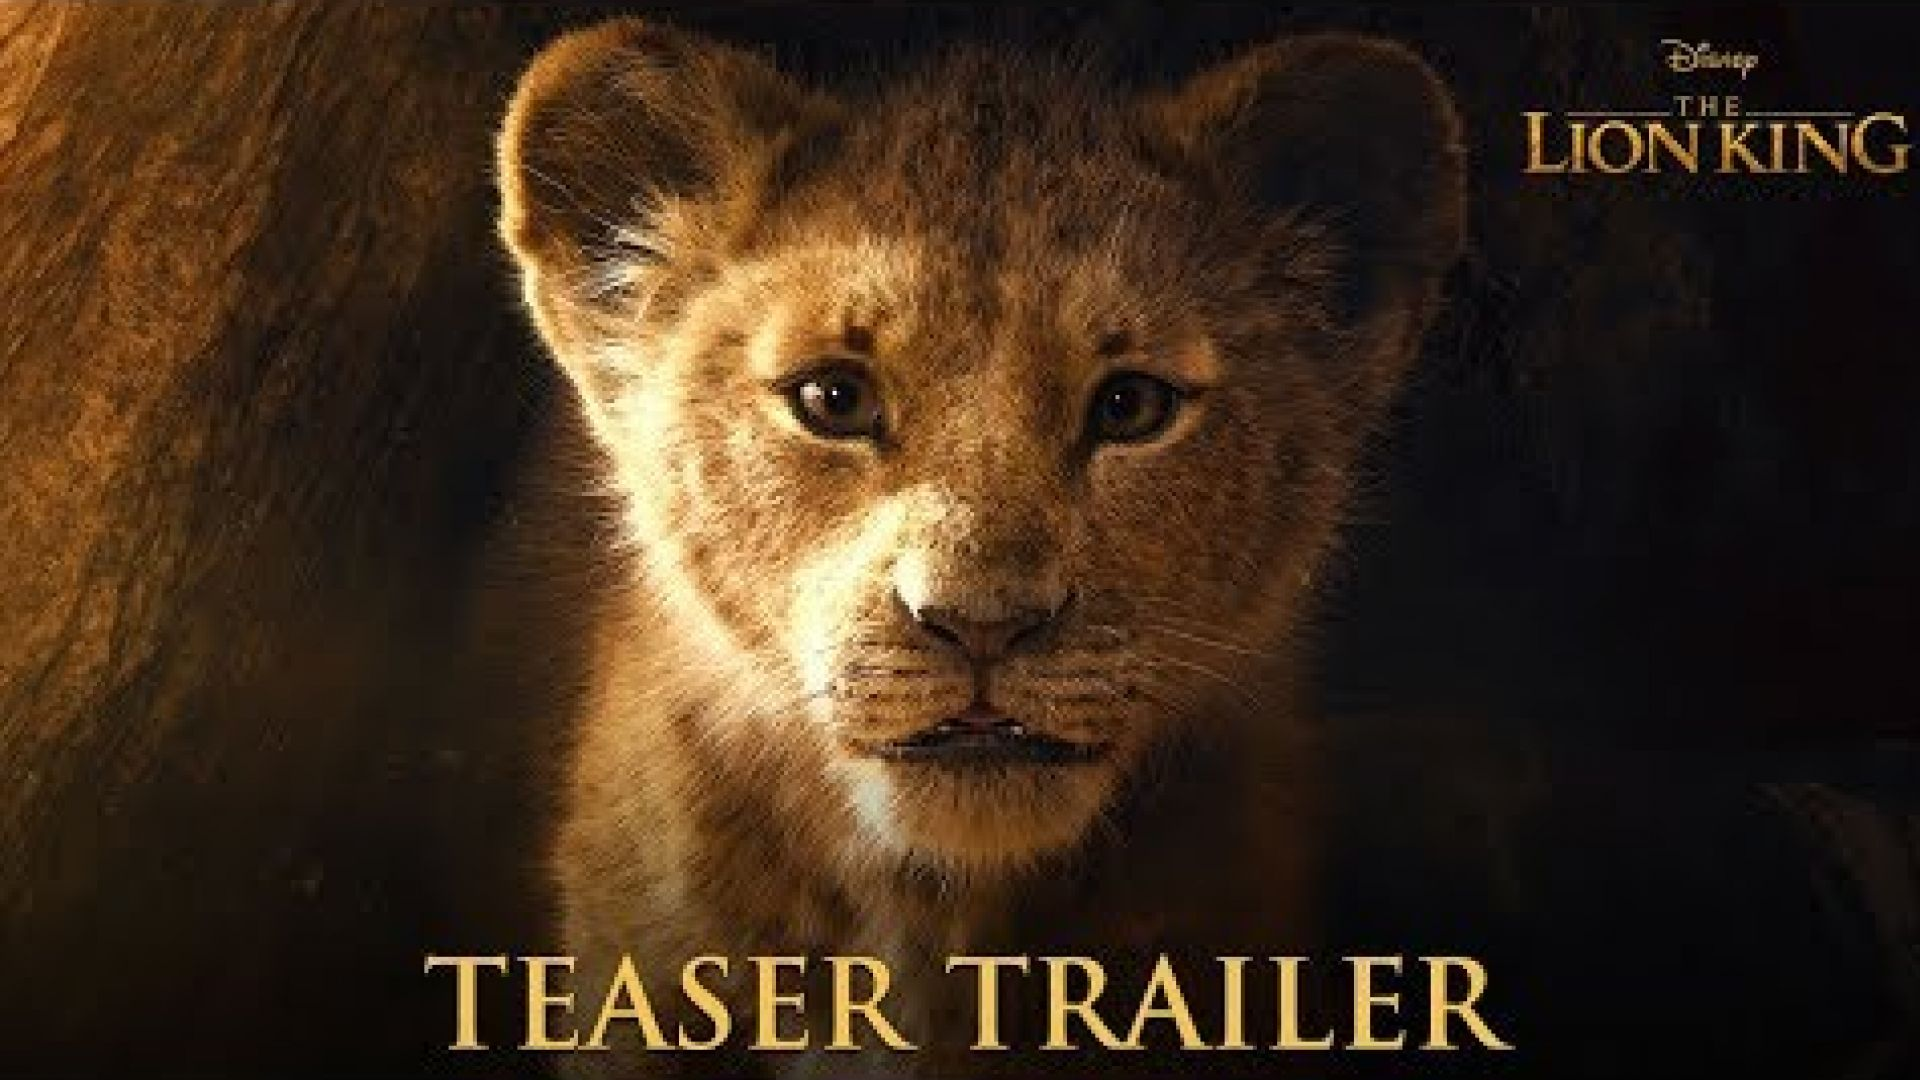 'The Lion King' 2019 Teaser Trailer